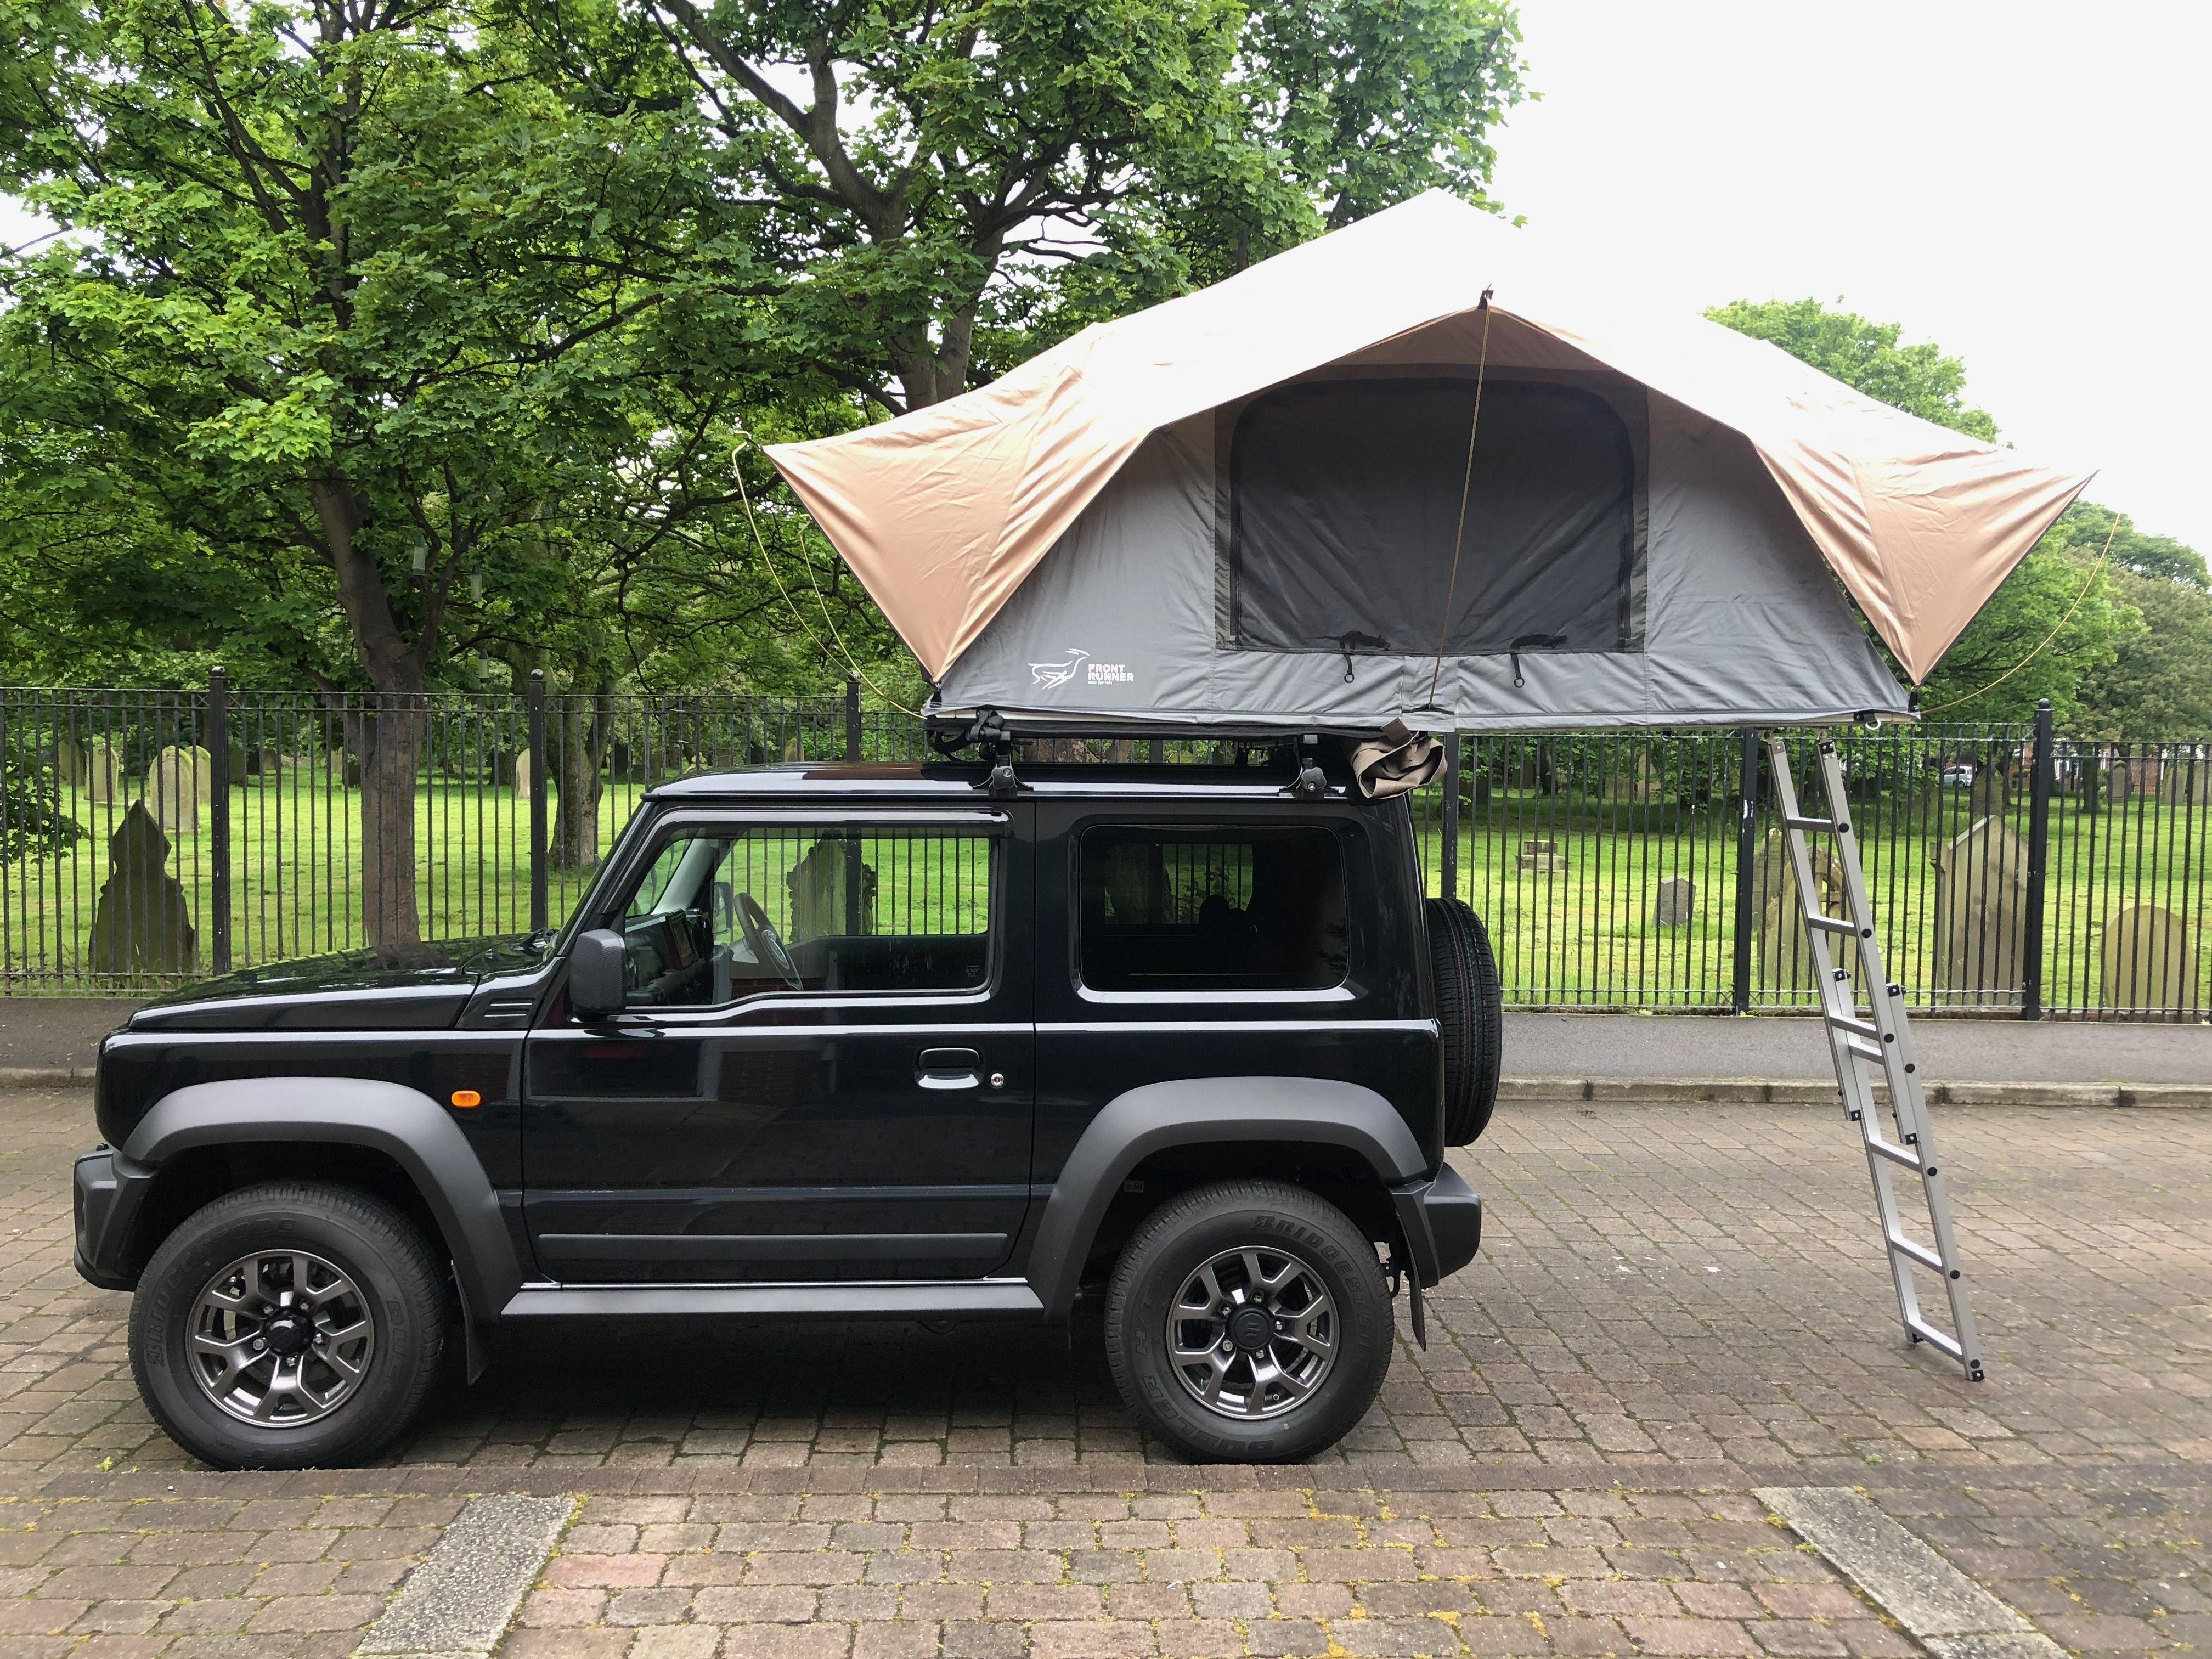 Jimny Roof Top Tent Suzuki Jimny Roof Top Tent New Suzuki Jimny